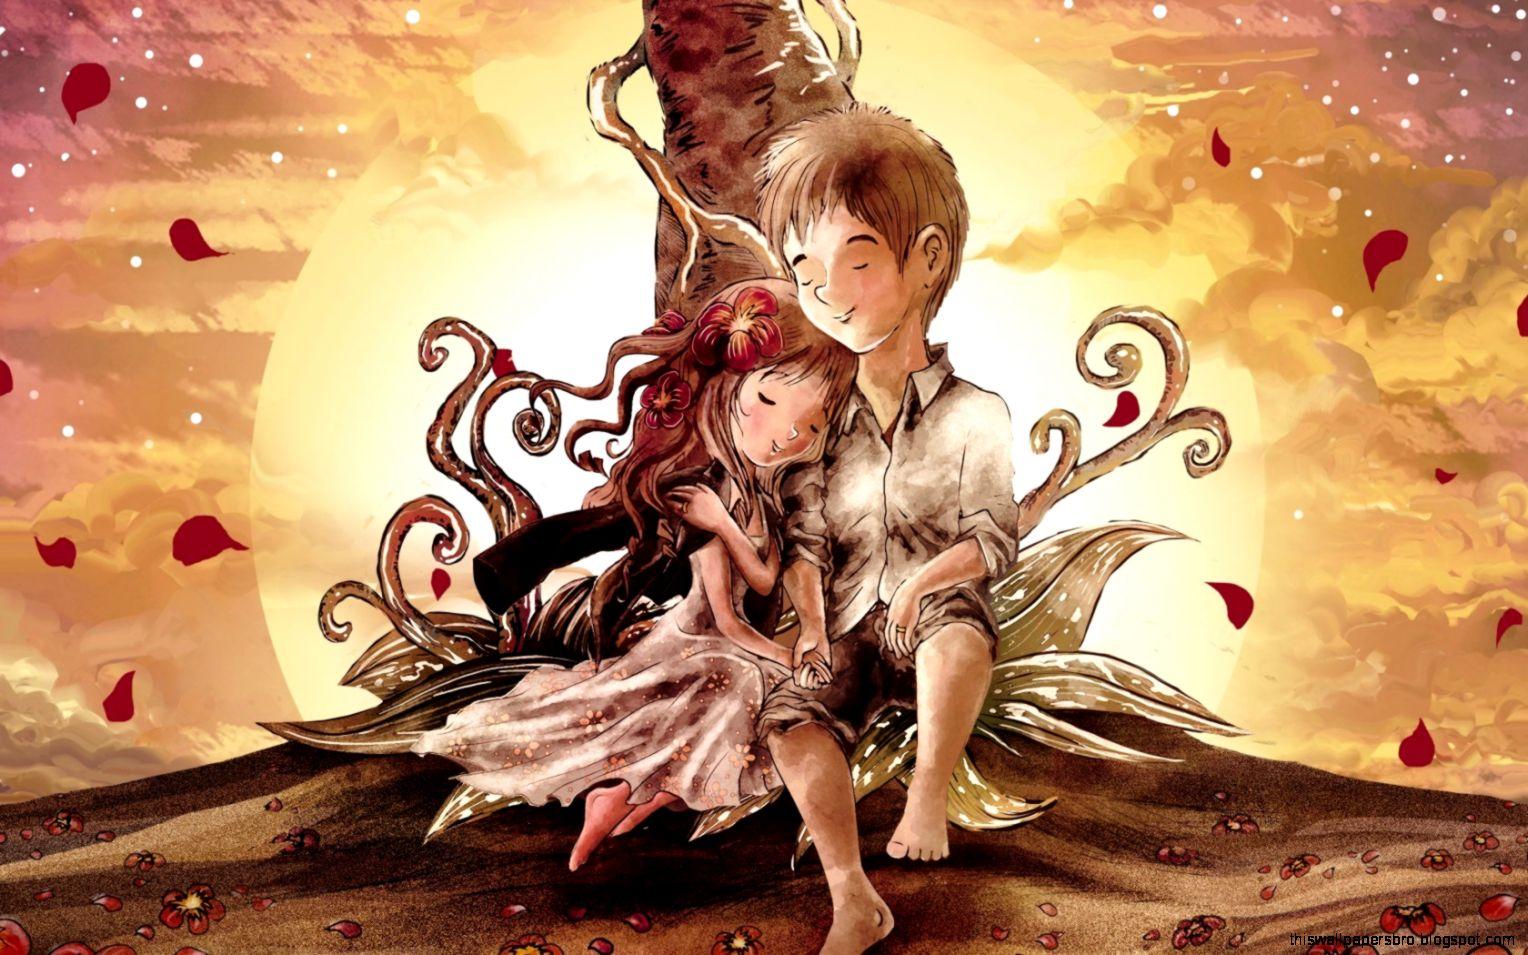 Anime Girl Boy Hd Wallpaper Full Hd Widescreen Wallpaper Free This